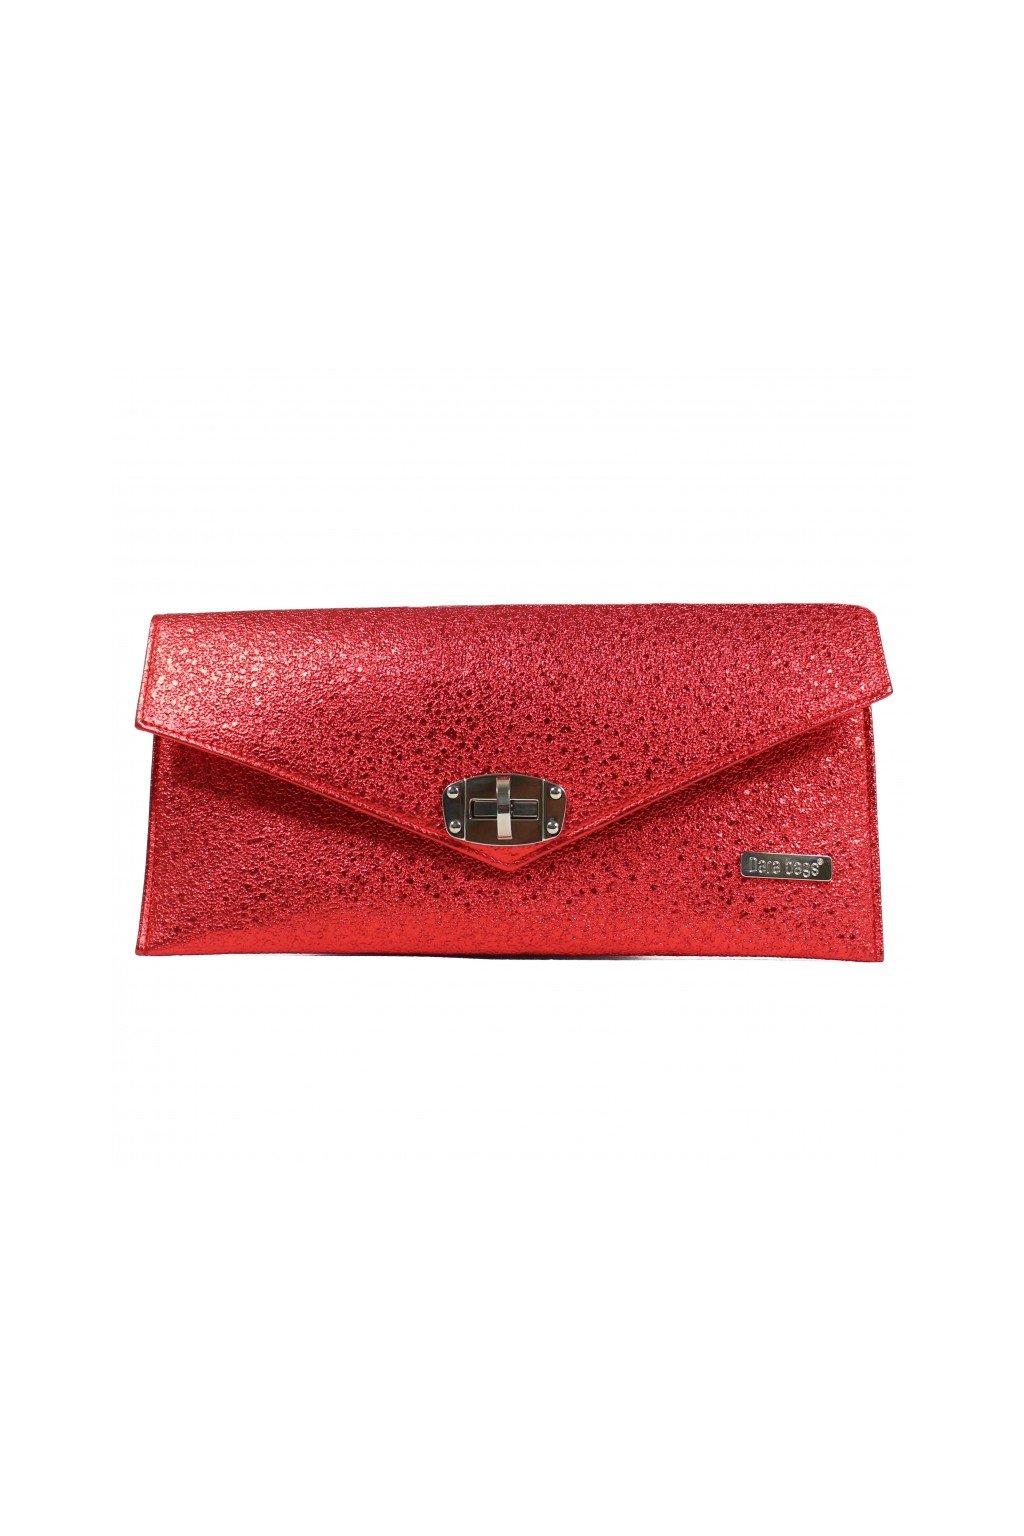 Malá třpytivá kabelka Malibu Classy Dara bags červená 1